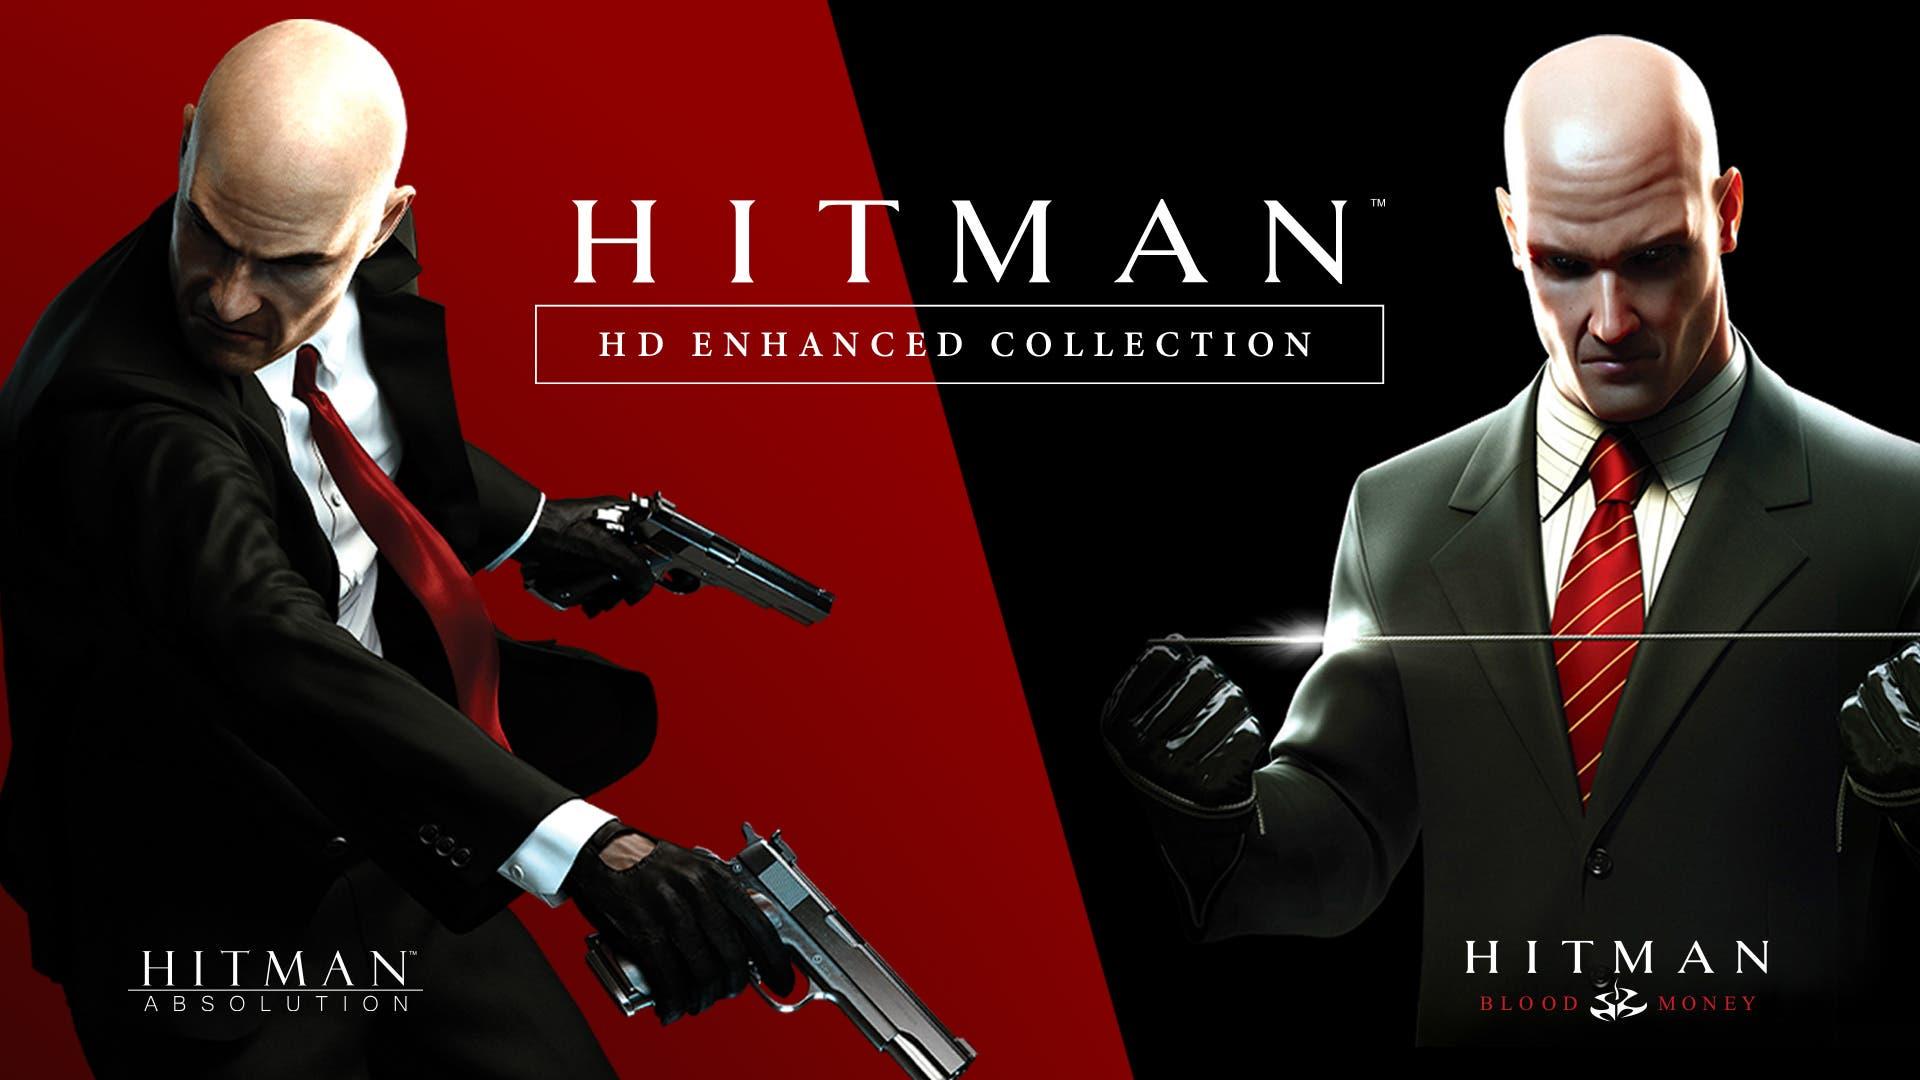 Hitman HD Enhanced Collection Key Art 1546550599